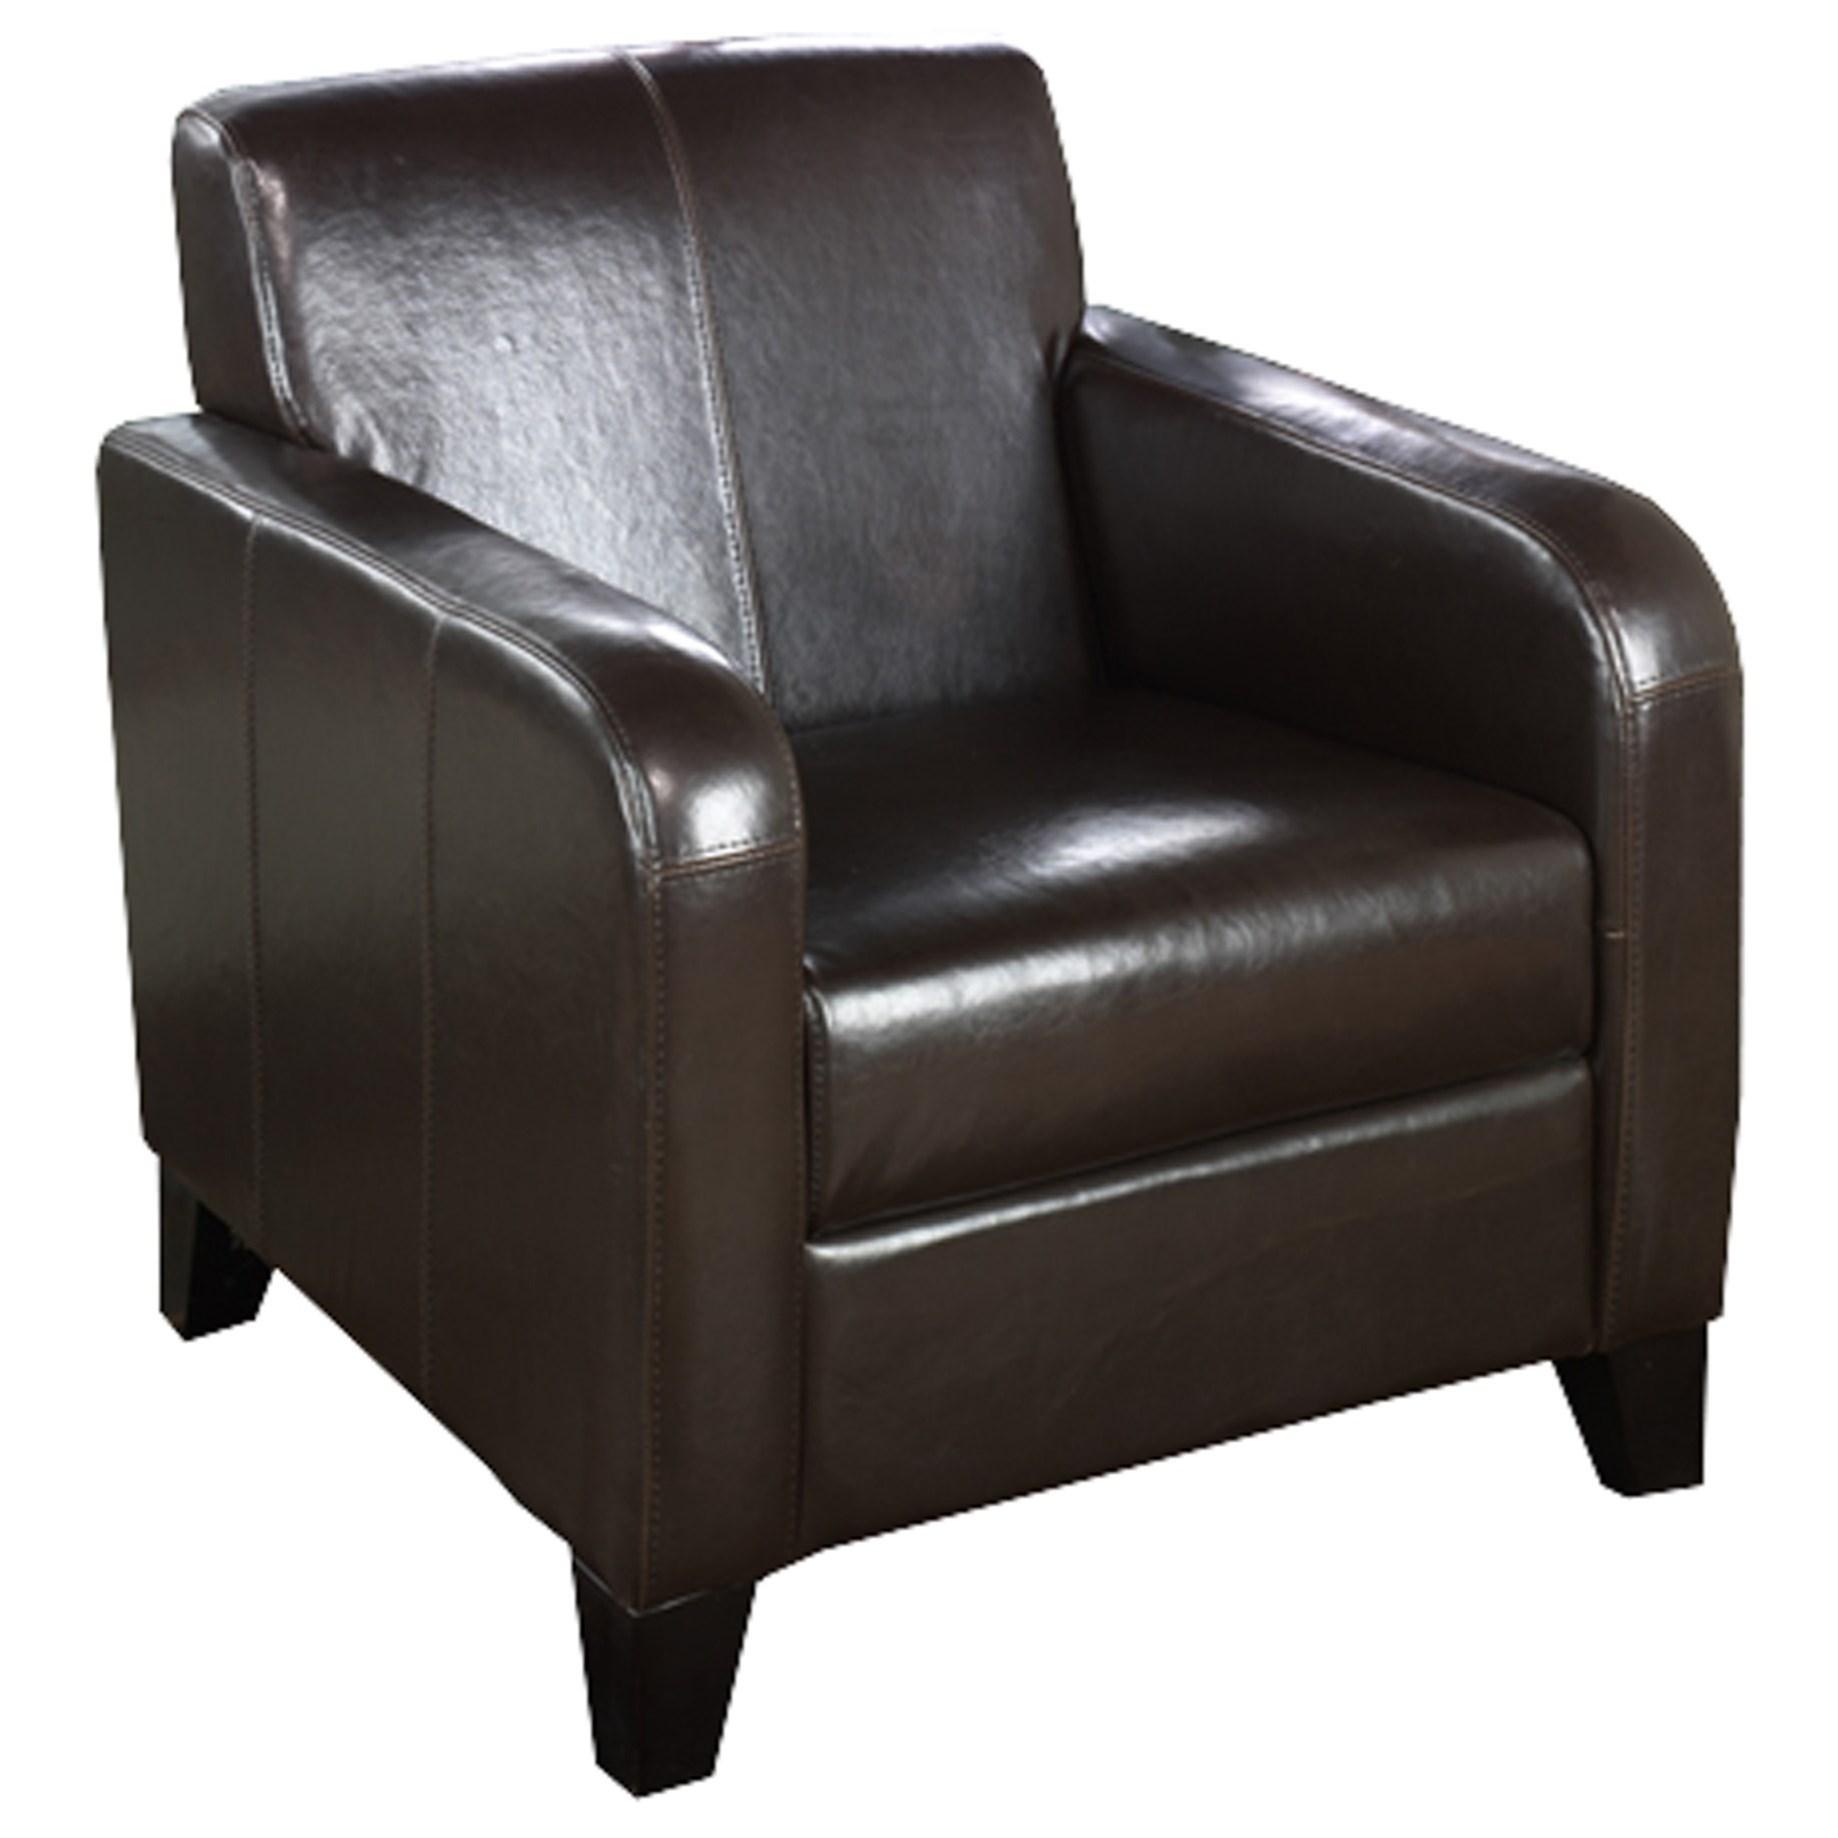 1400 Club Chair by Armen Living at Dream Home Interiors